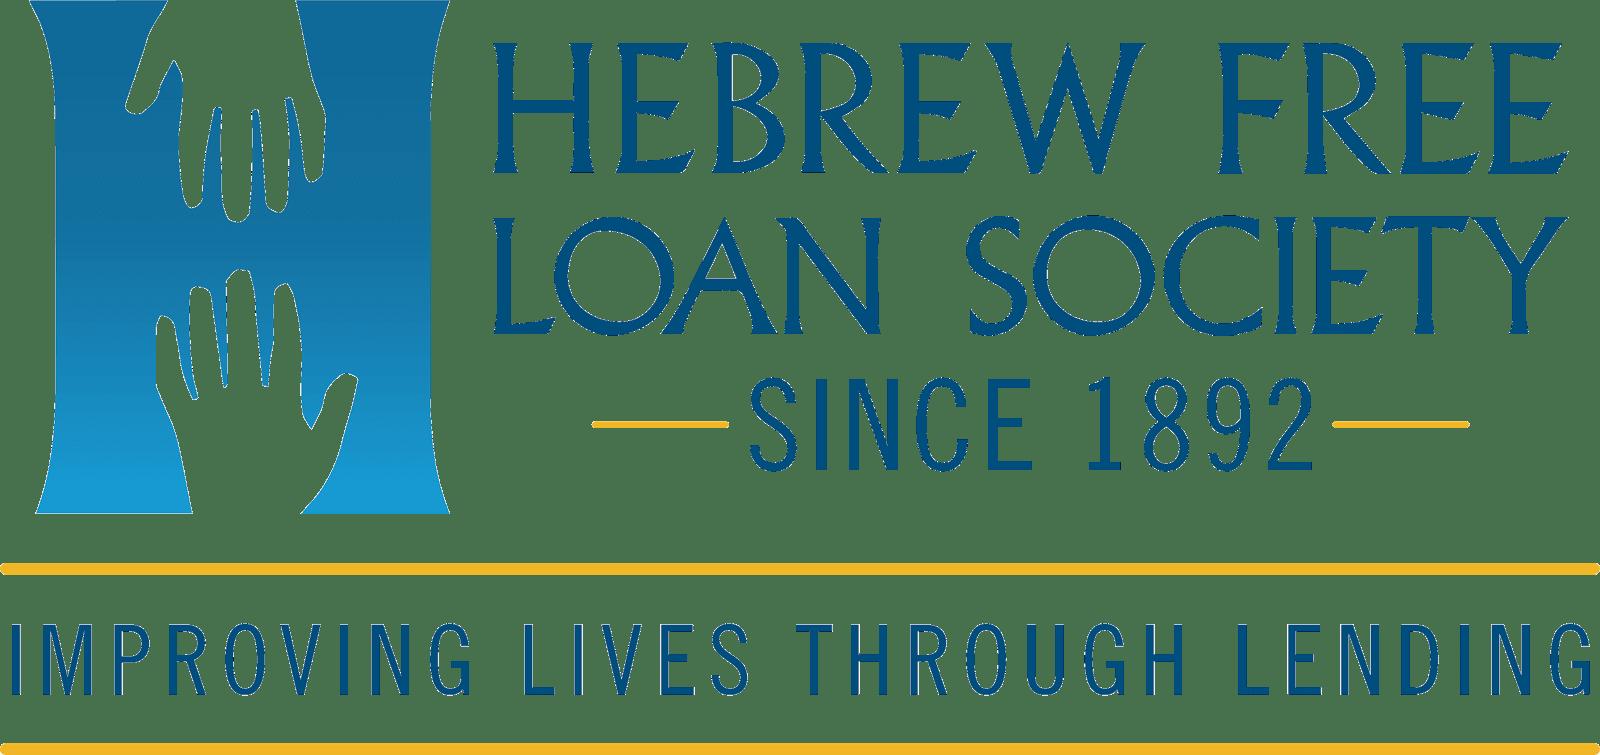 hebrewfreeloansocietylogo